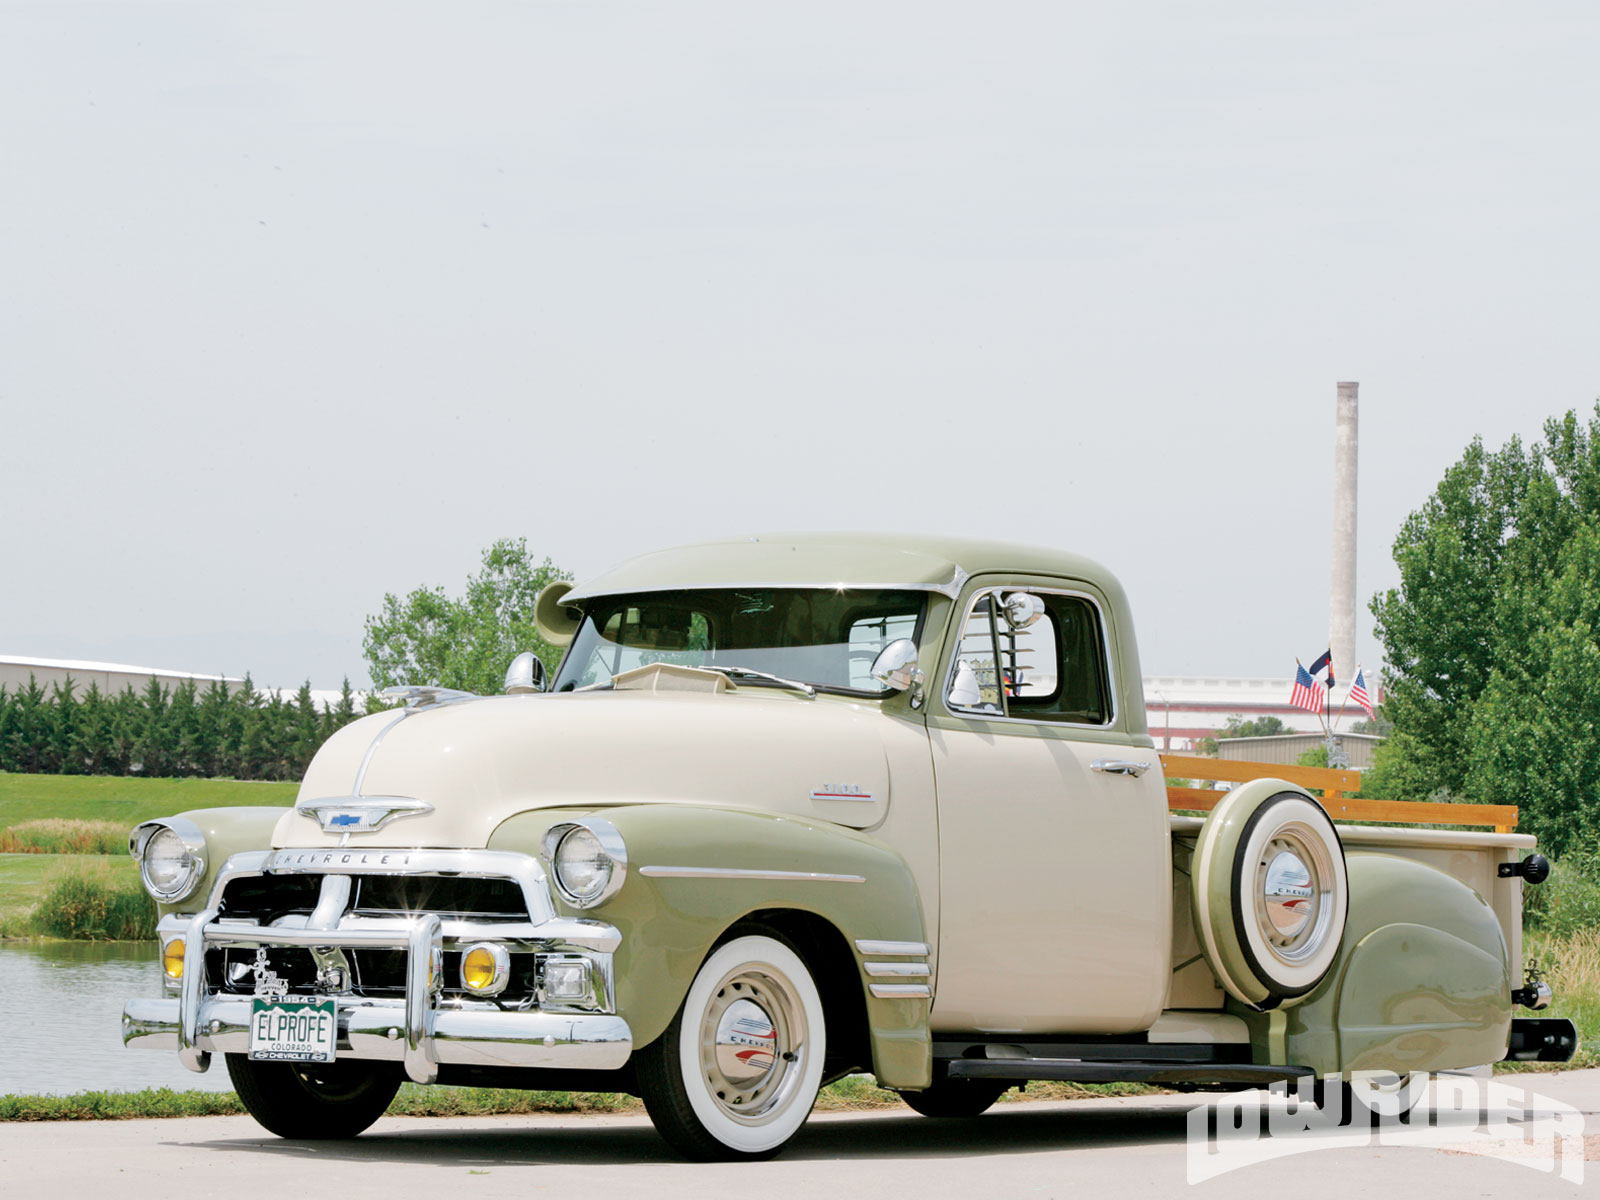 1954 Chevrolet 3100 Series Truck - Lowrider Magazine 4853f5dabeb